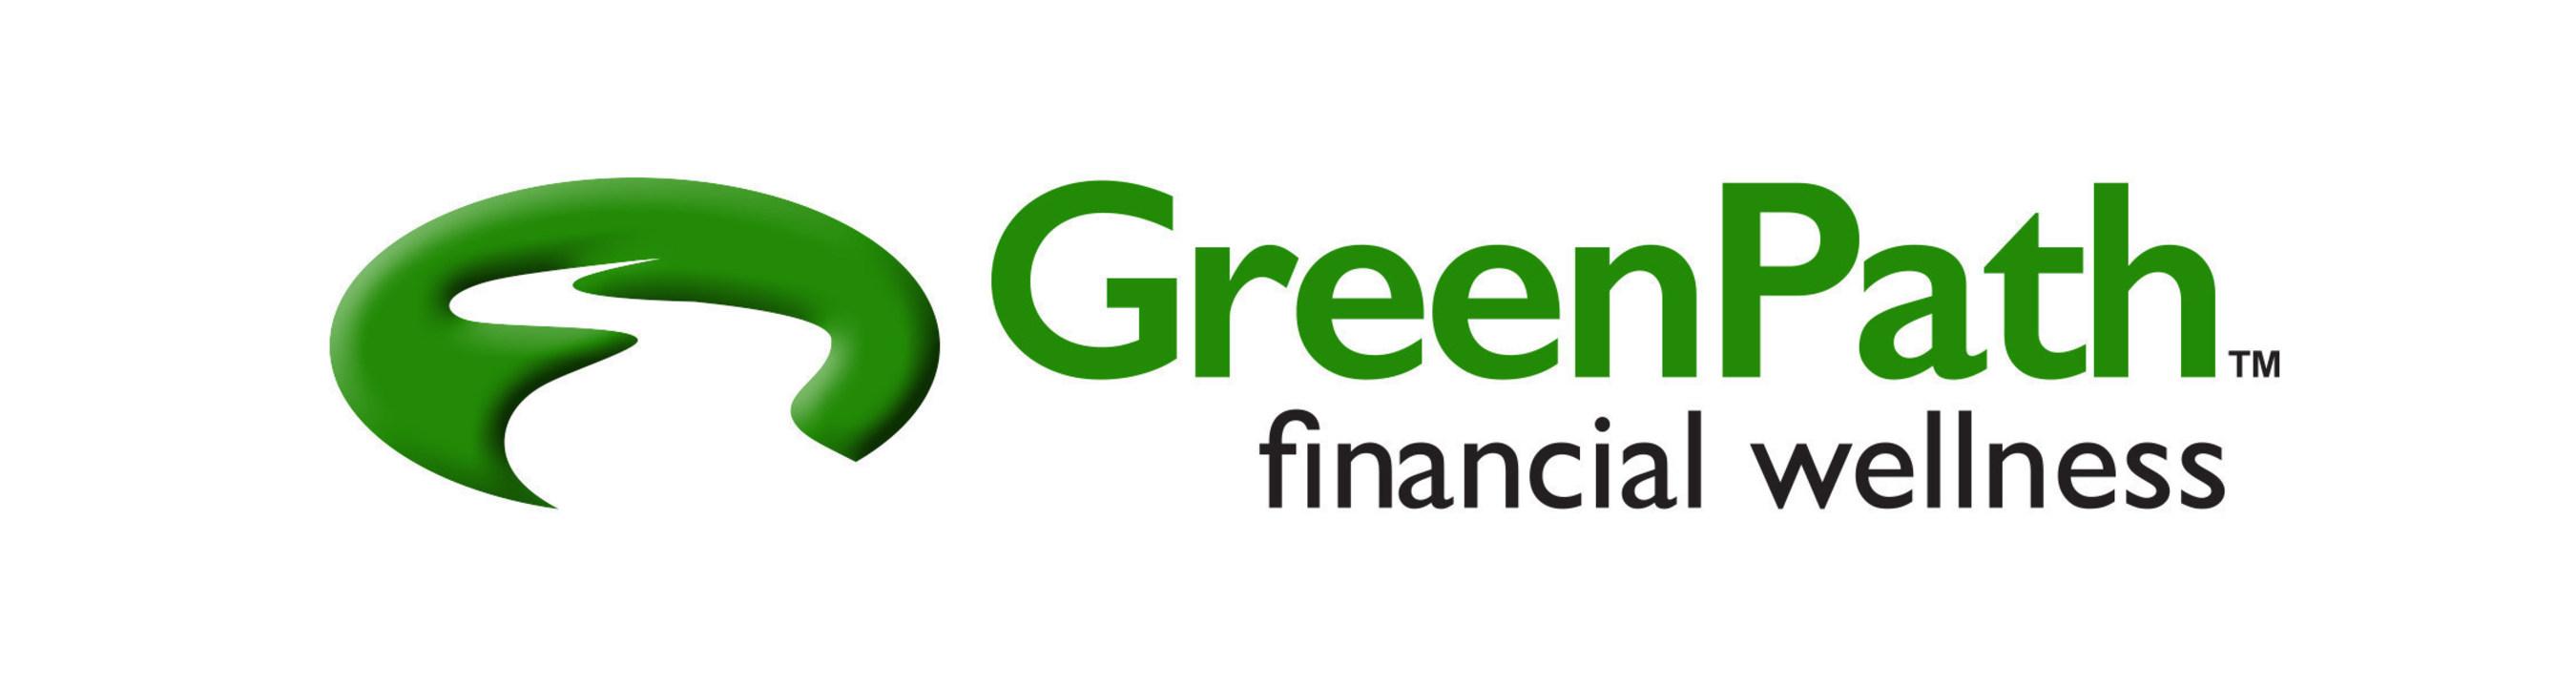 GreenPath Financial Wellness1